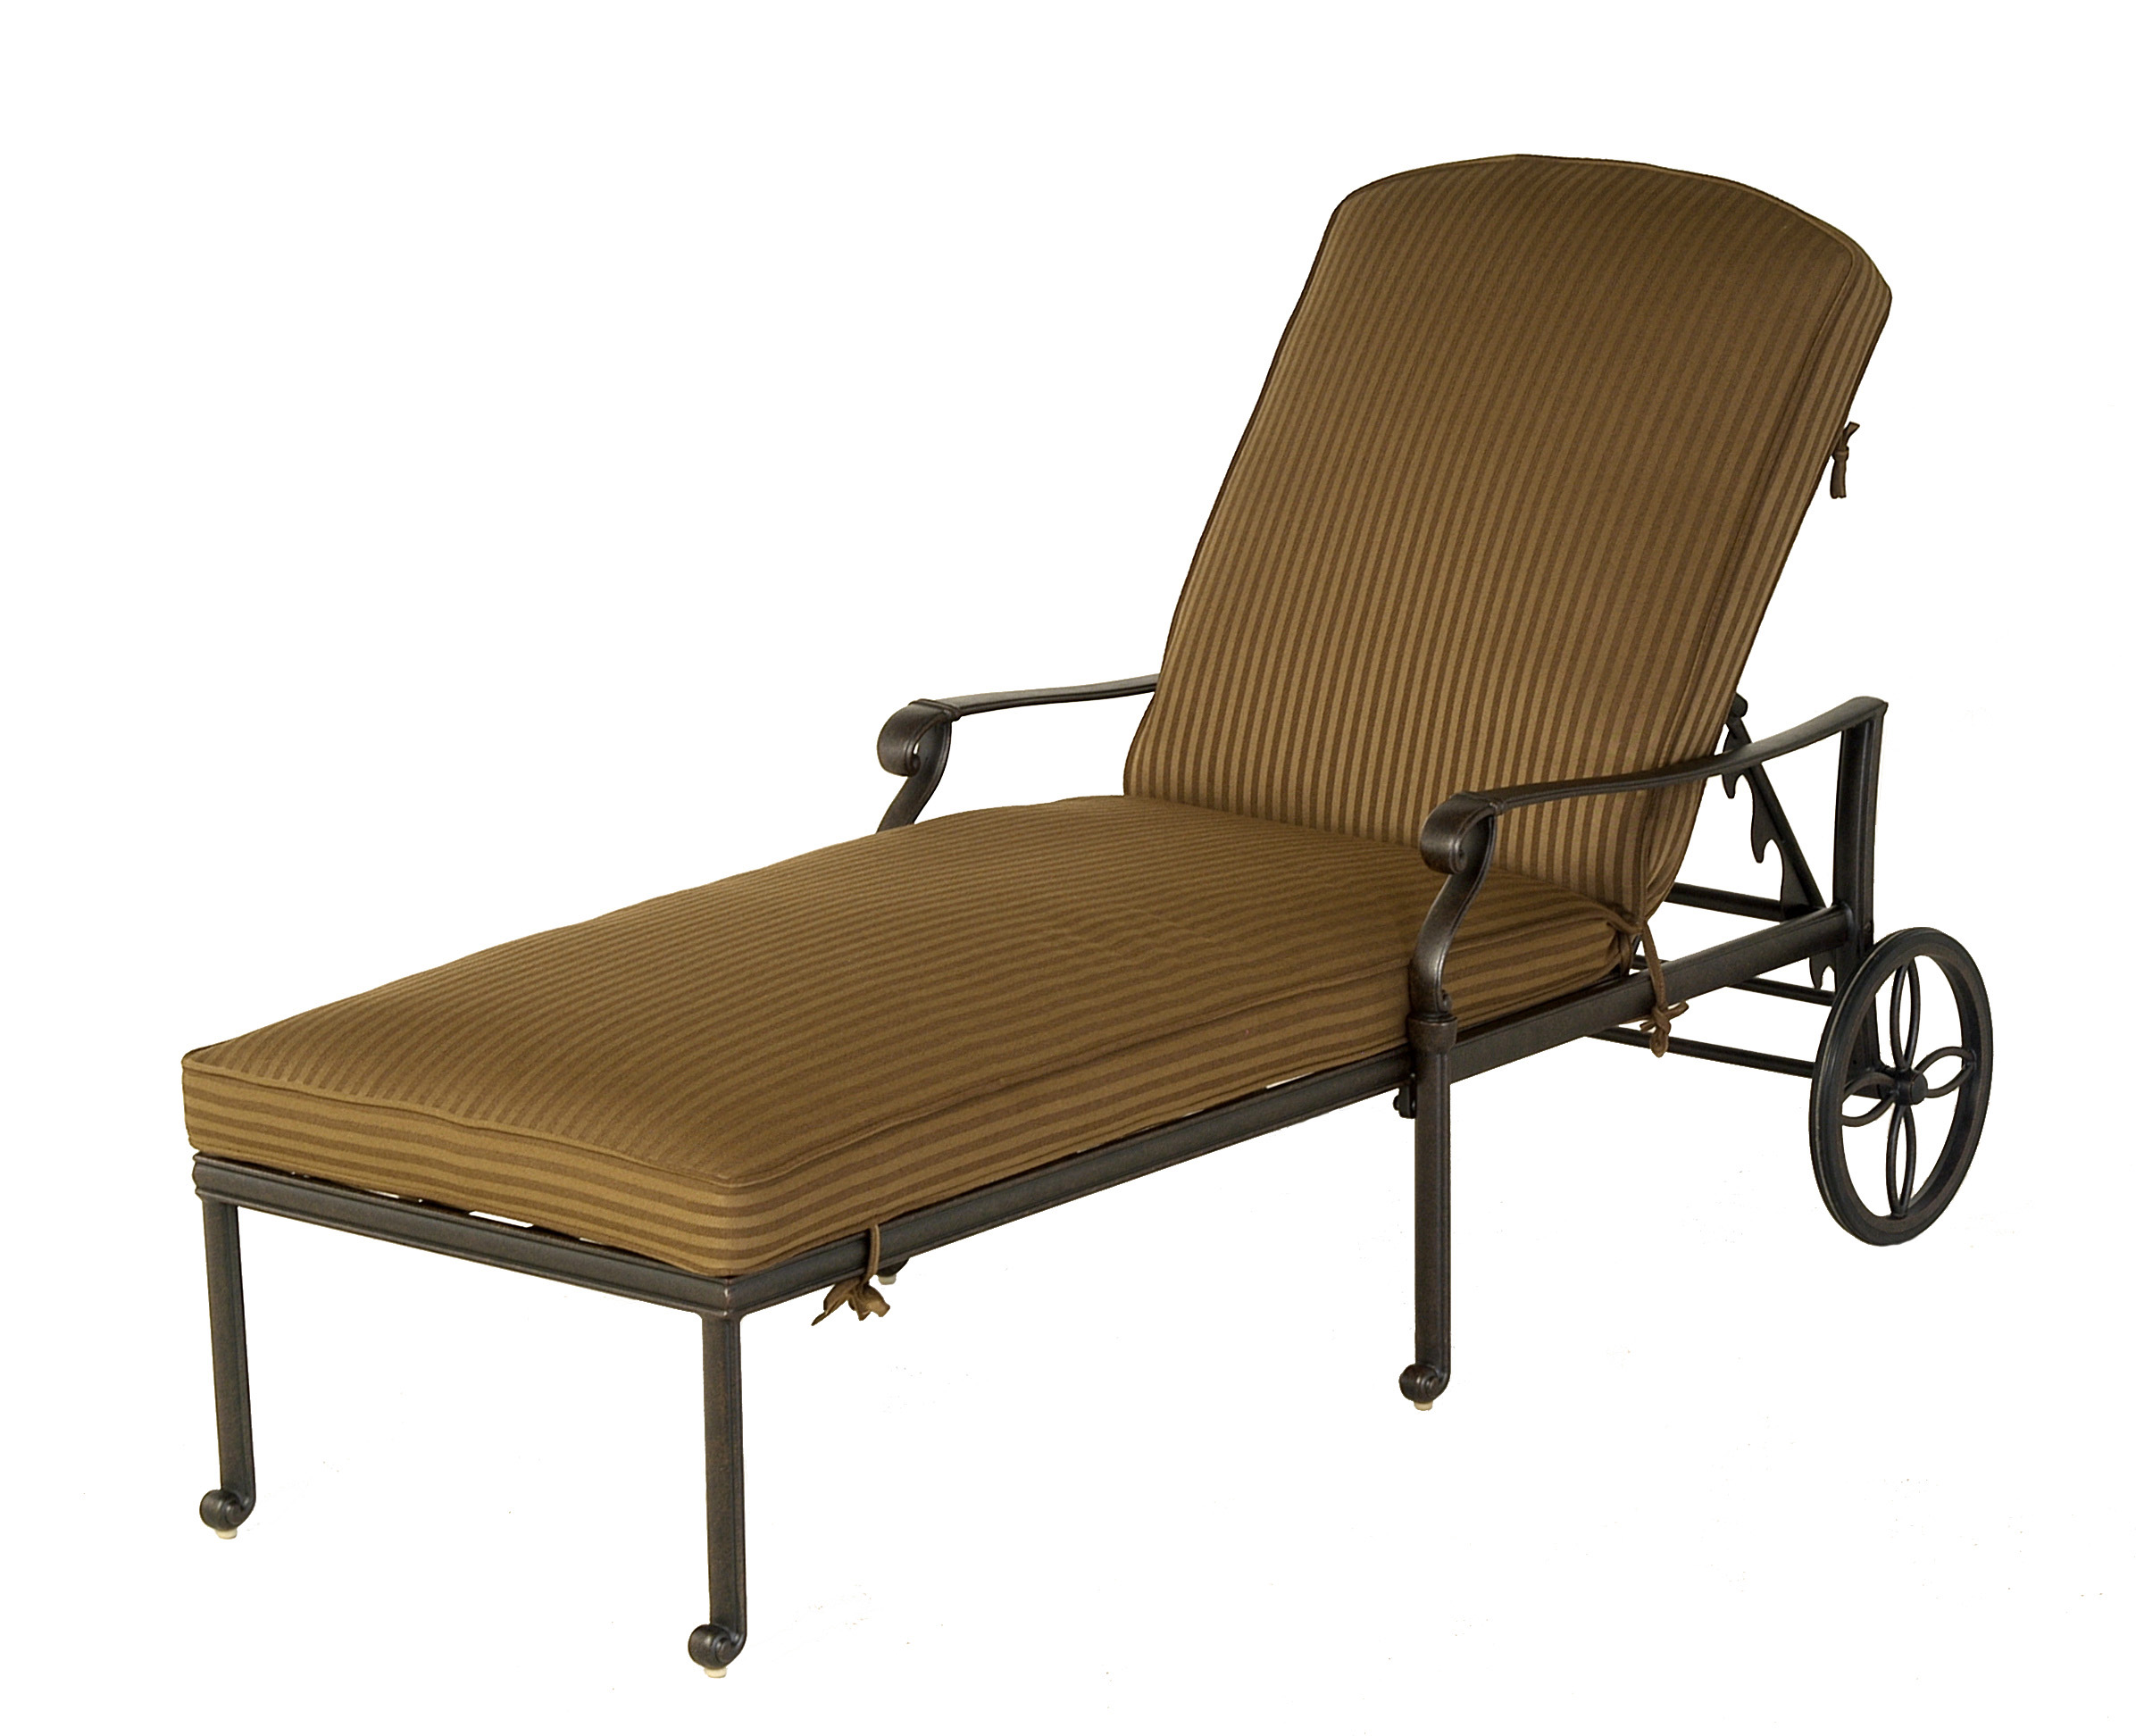 Mayfair Chaise Lounge